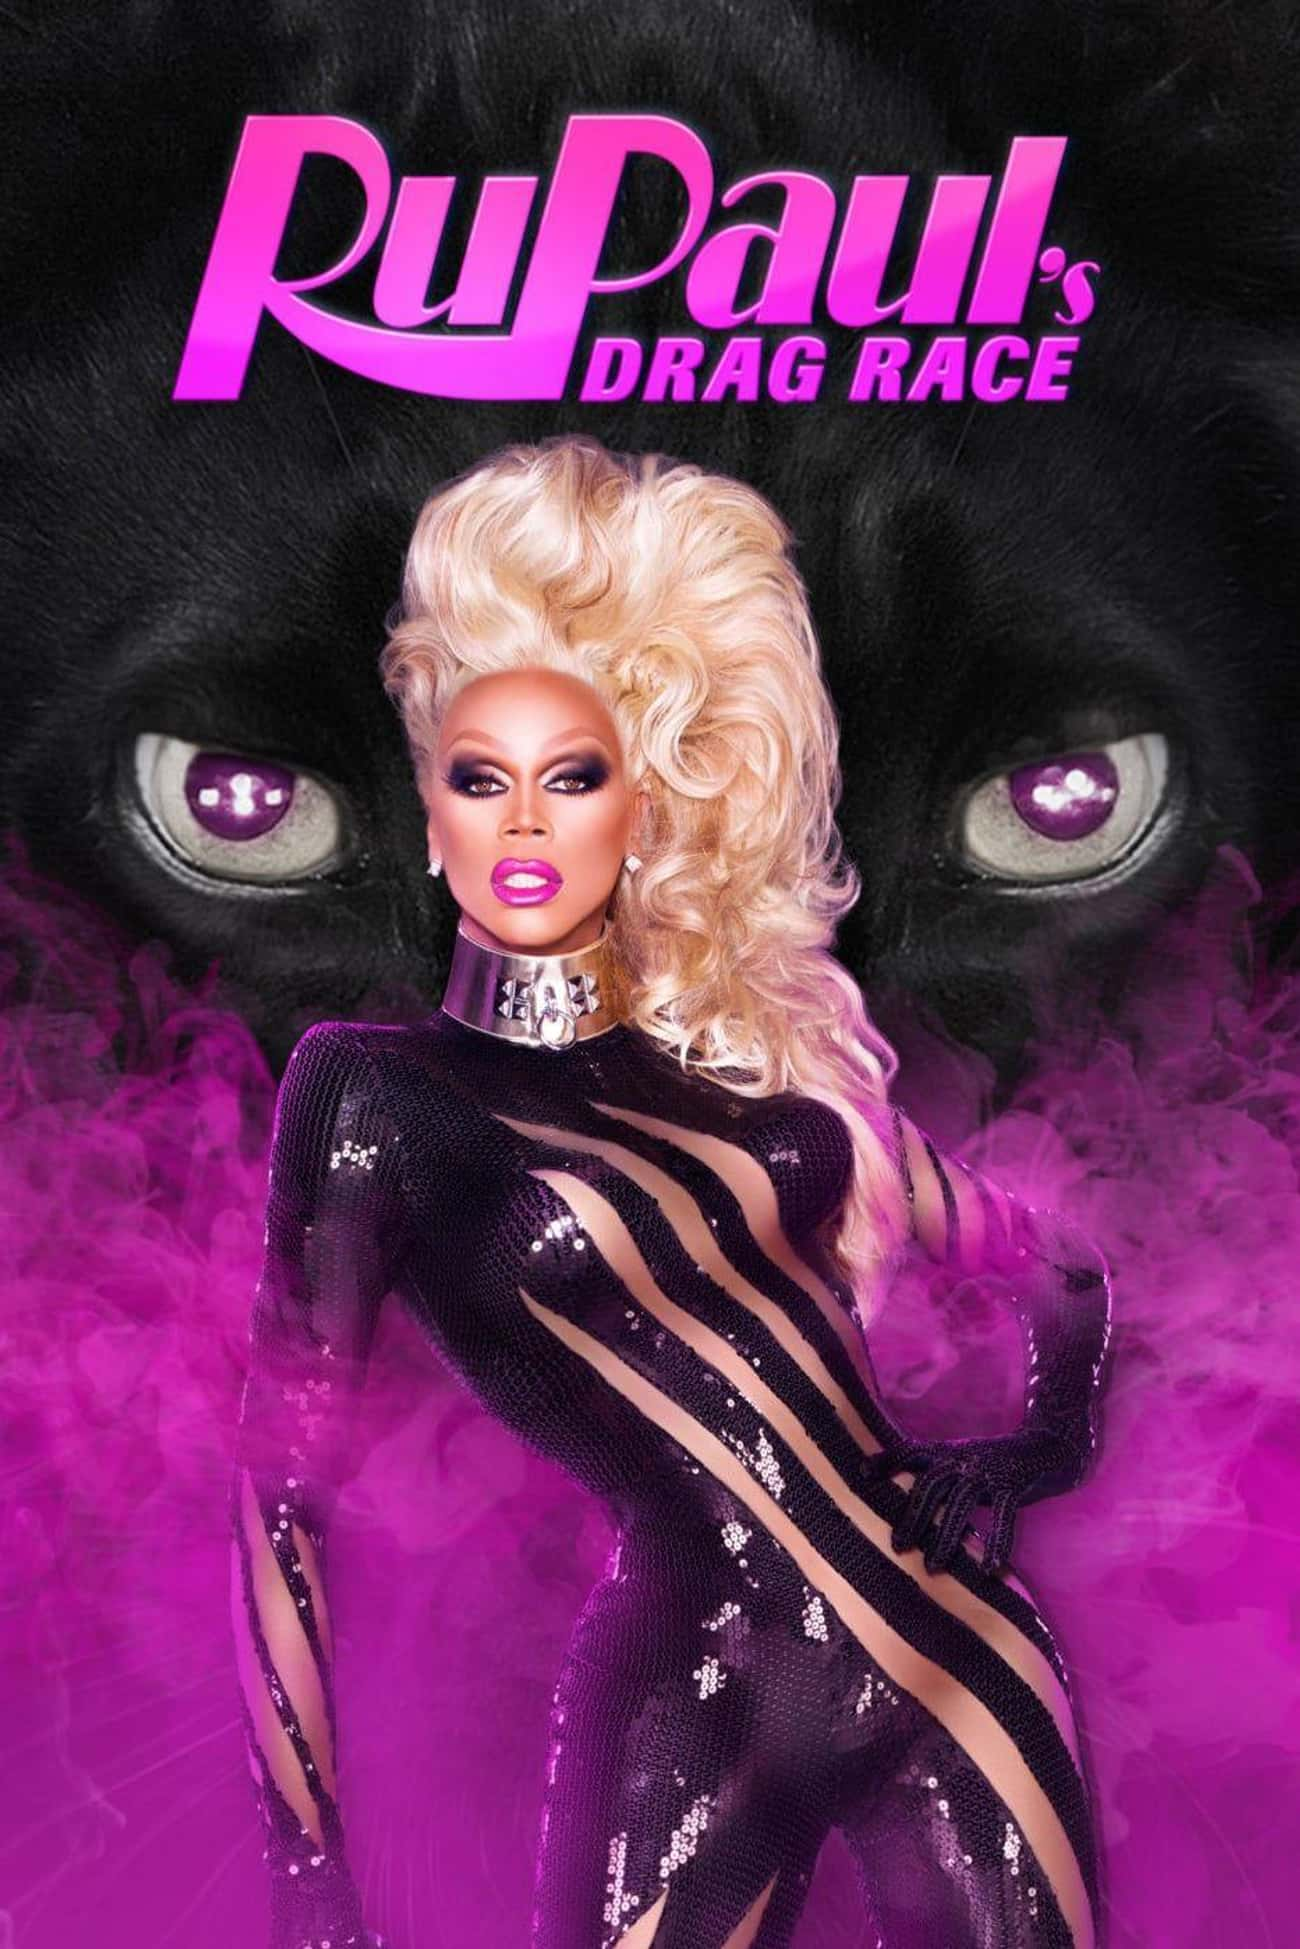 RuPaul's Drag Race - Season 6